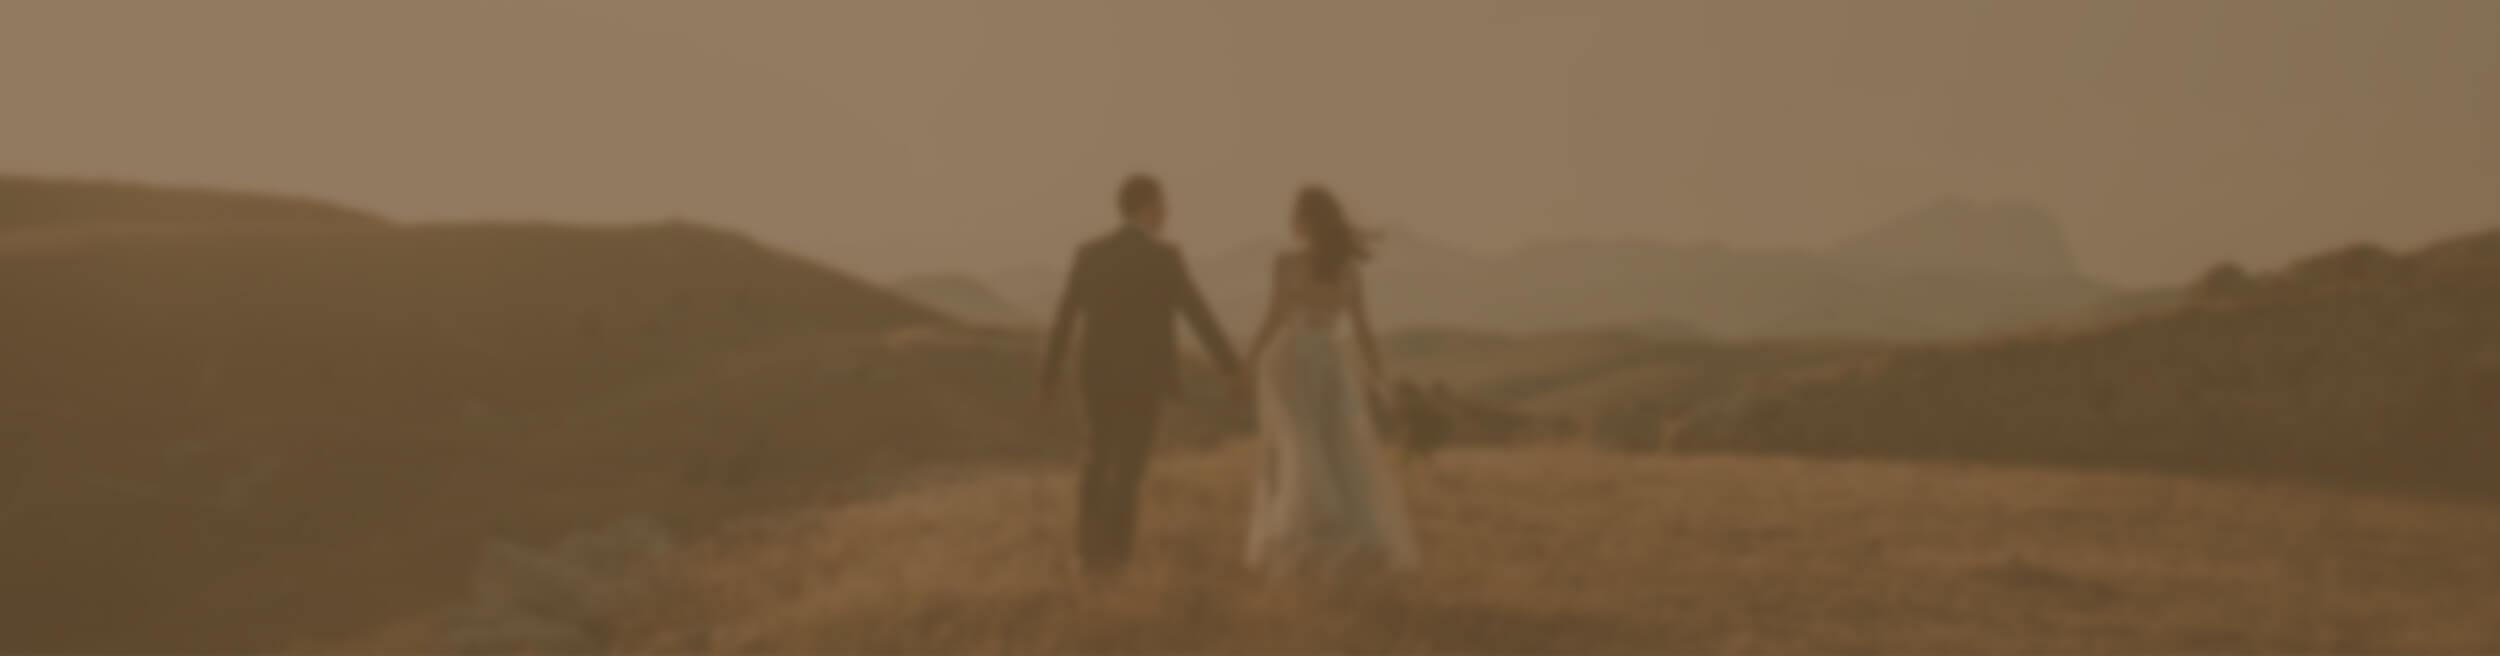 marriageprep2